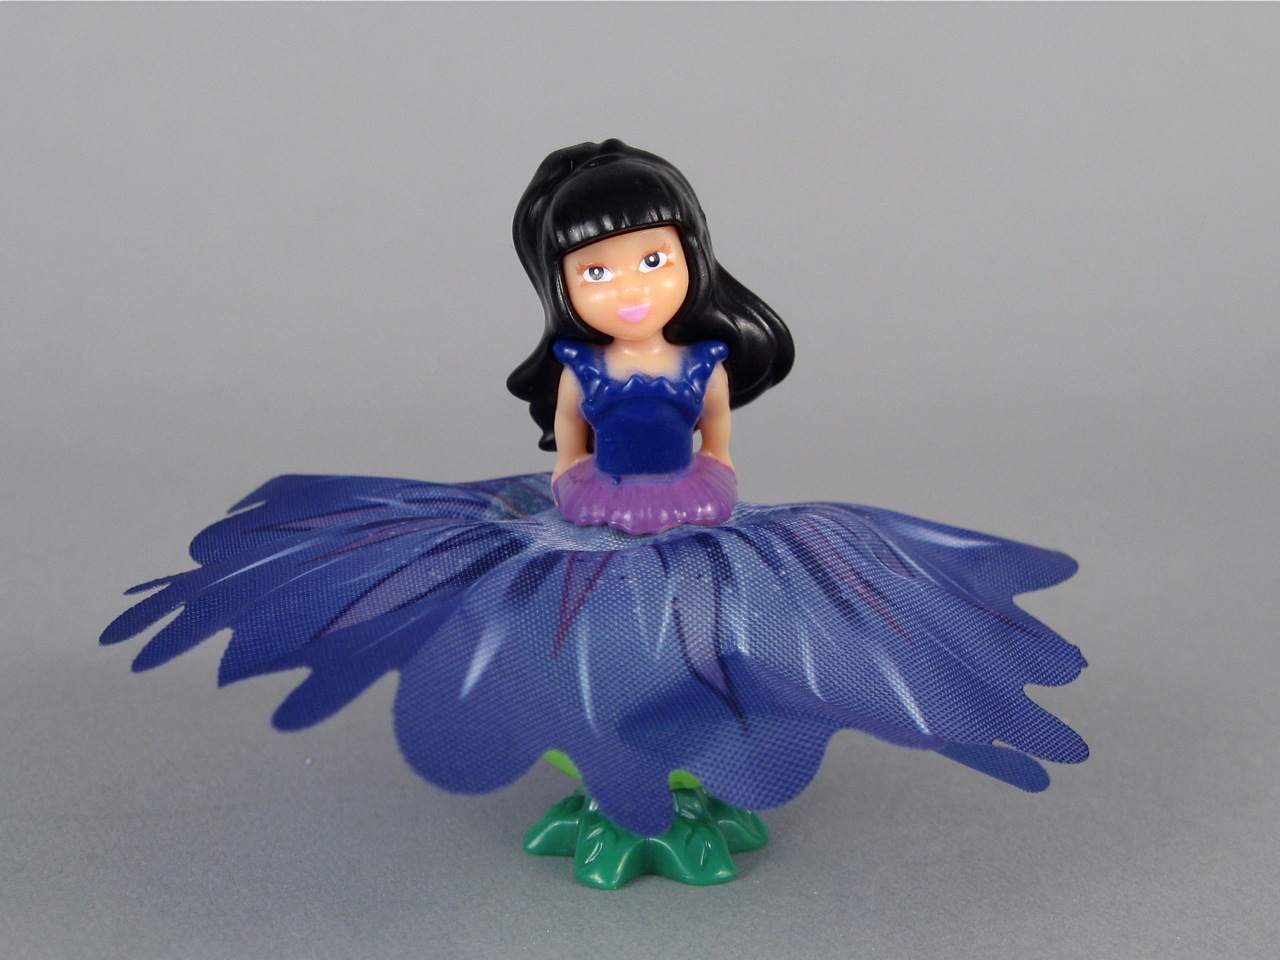 Flowee doll mini